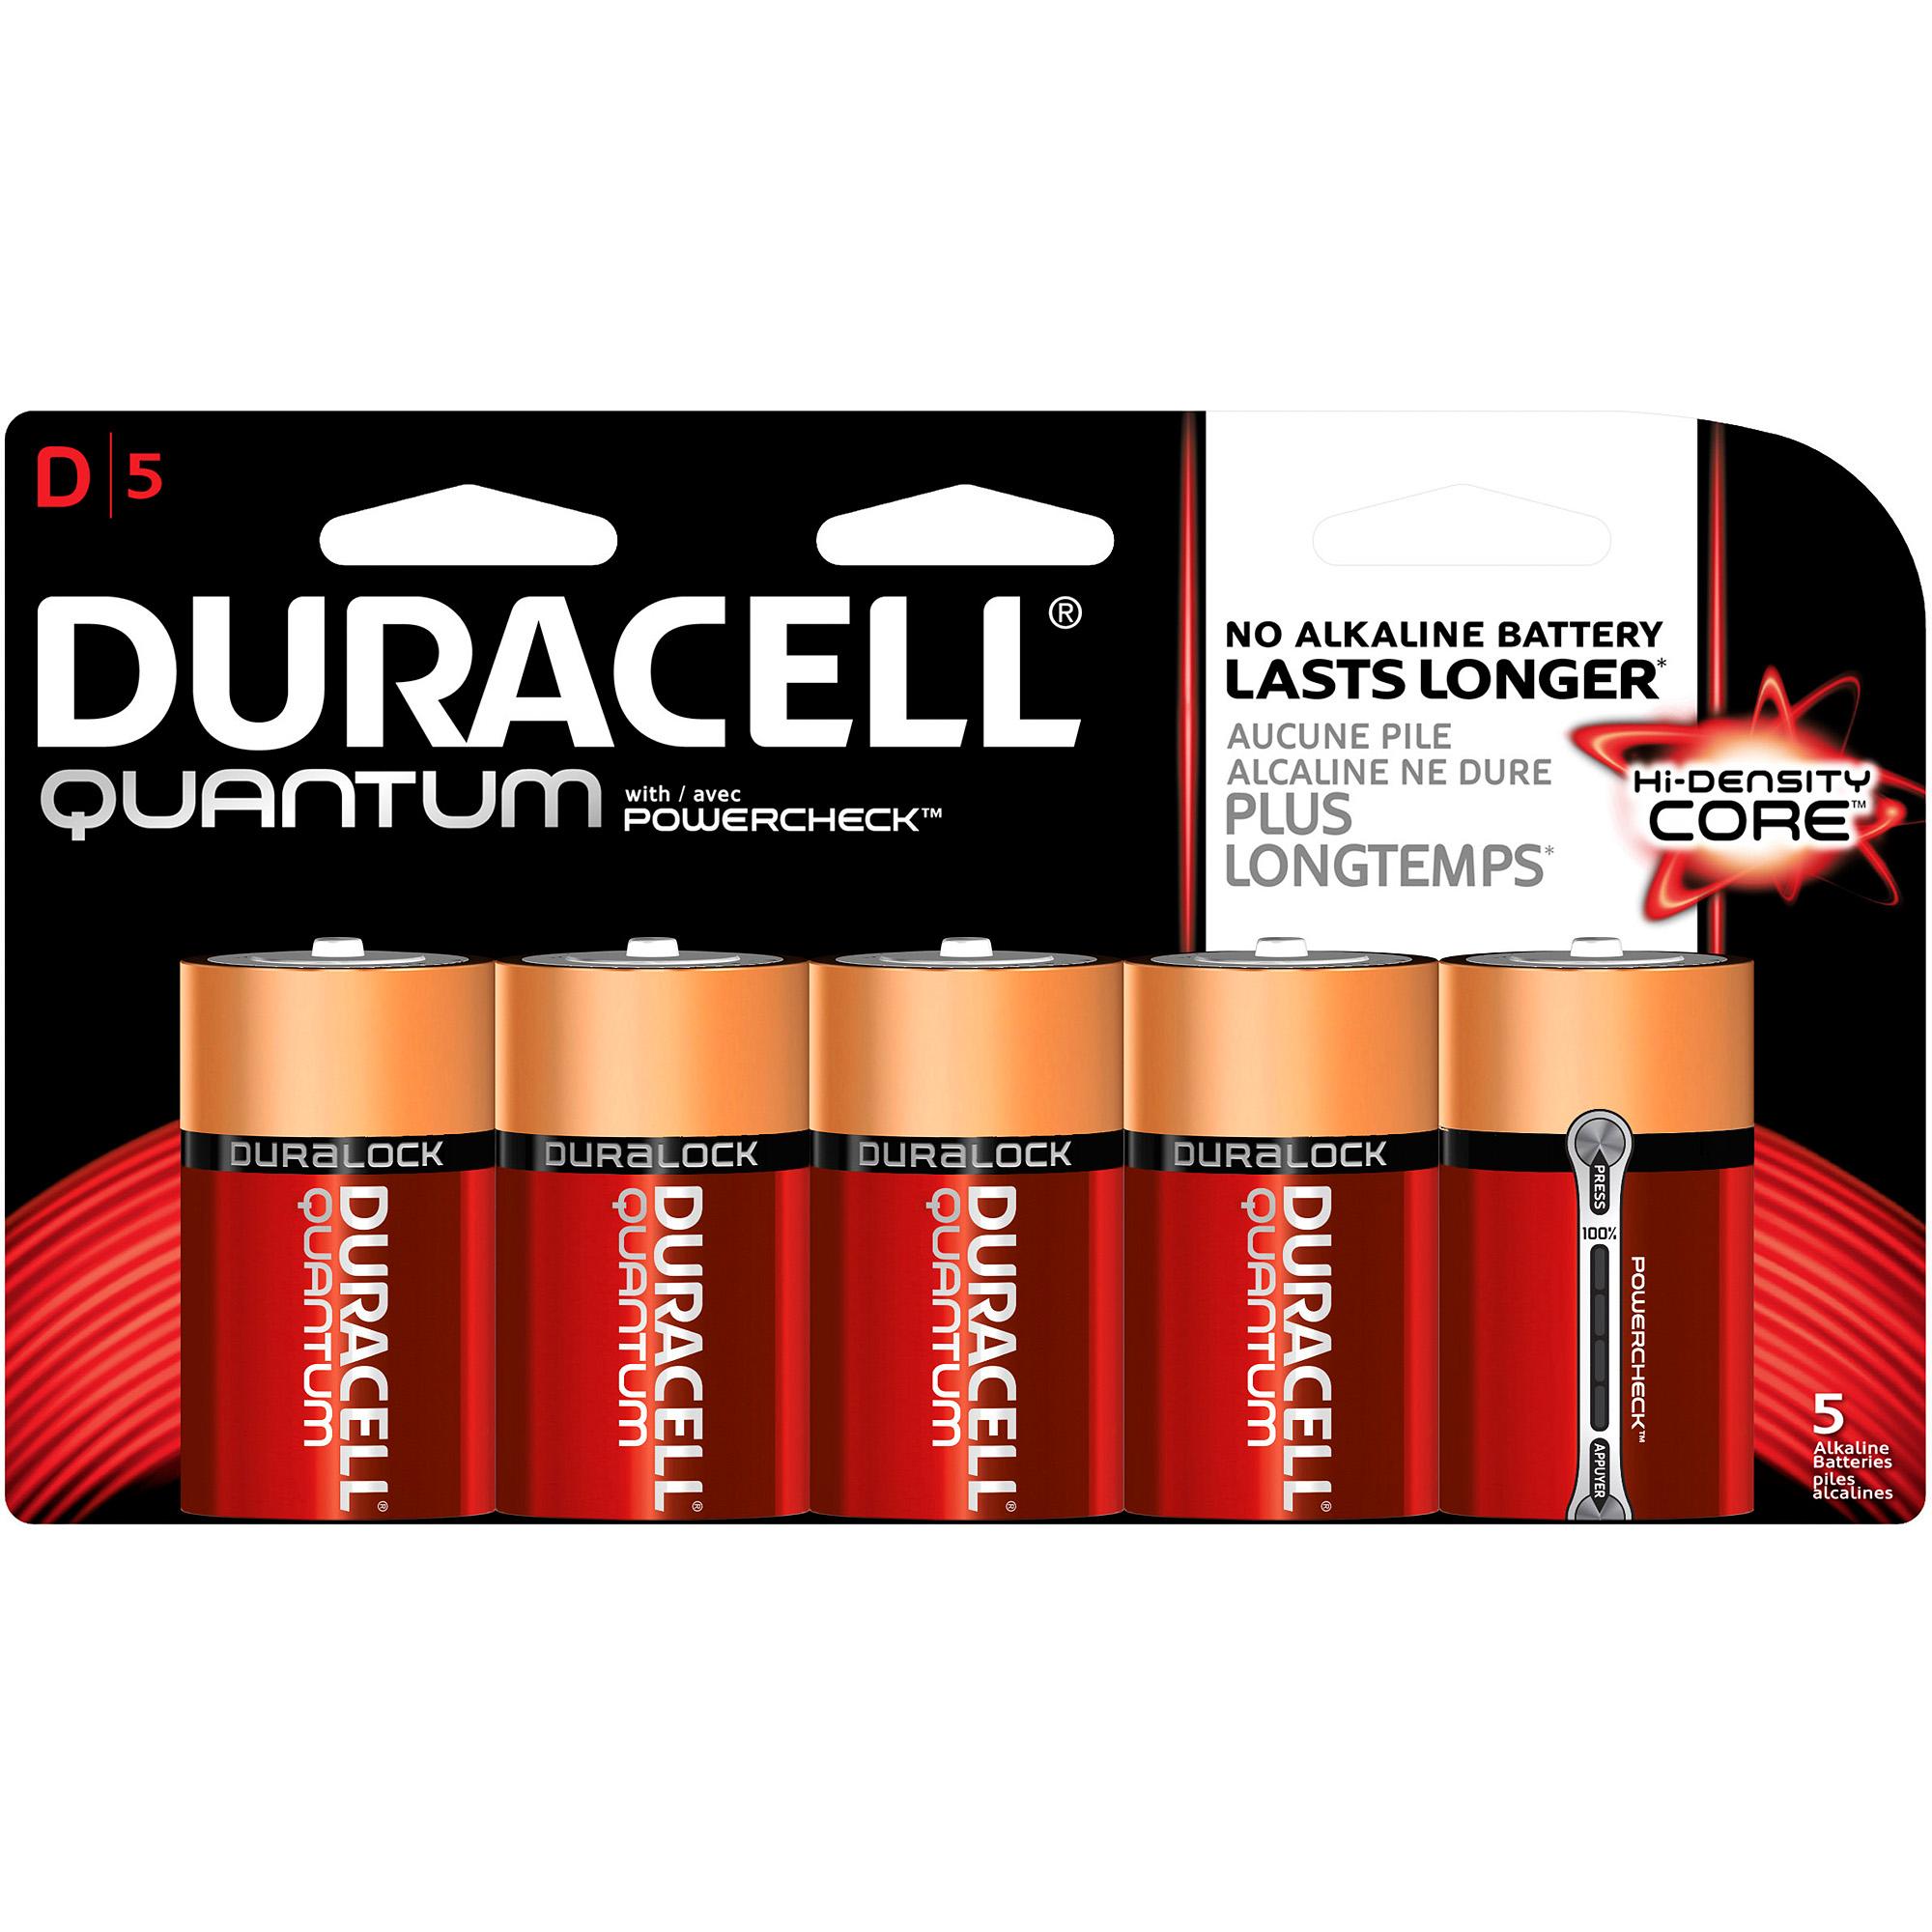 Duracell Quantum Batteries C or D 5 pack $1.49 + tax   YMMV  Walgreens